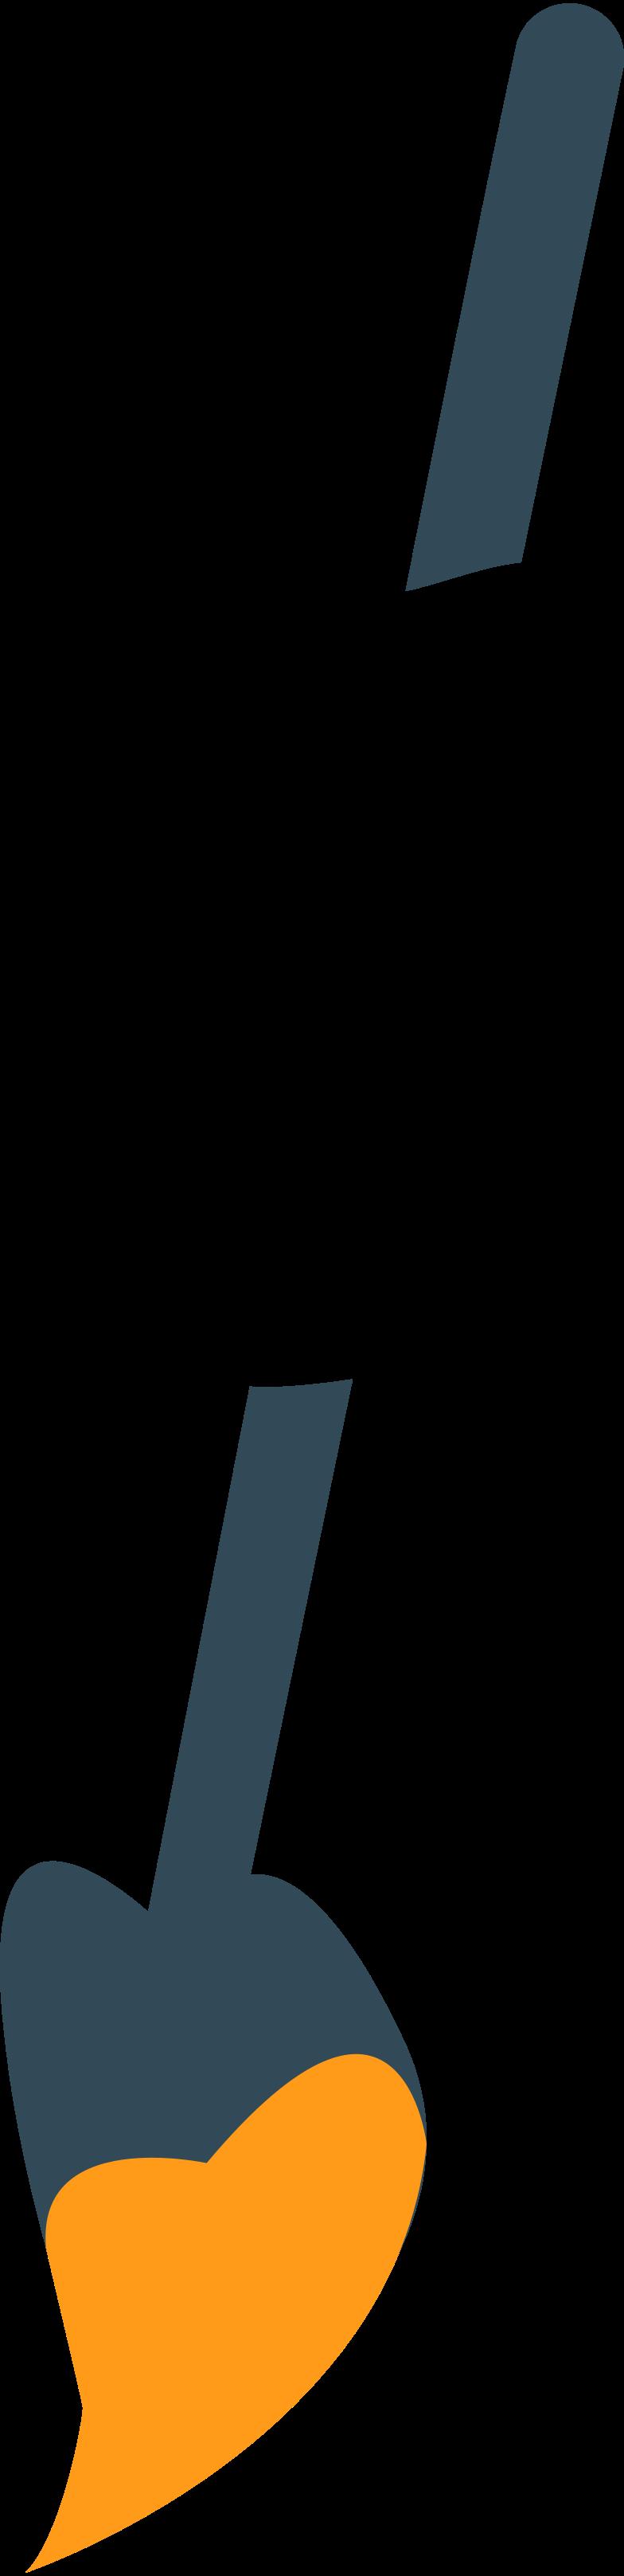 brush Clipart illustration in PNG, SVG